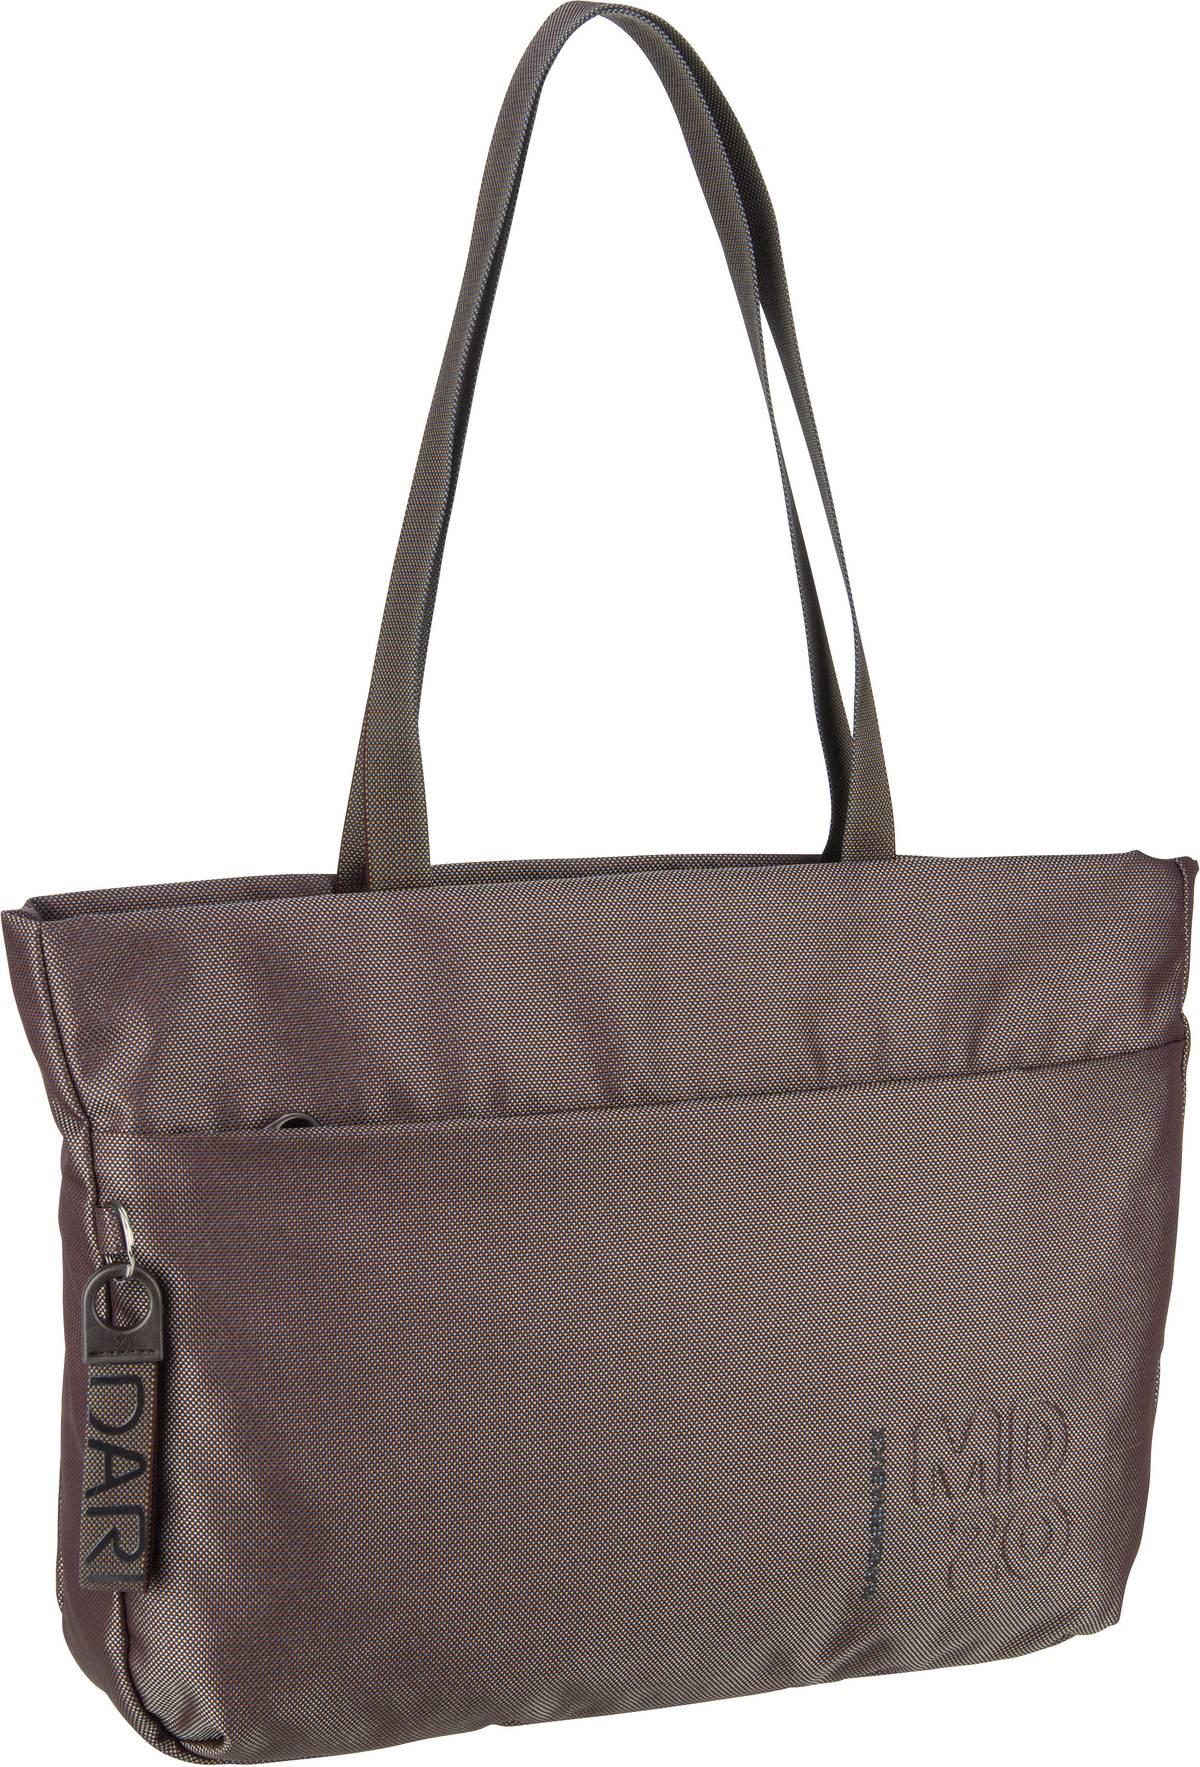 mandarina duck -  Handtasche MD20 Shoulder Bag QMT14 Mole